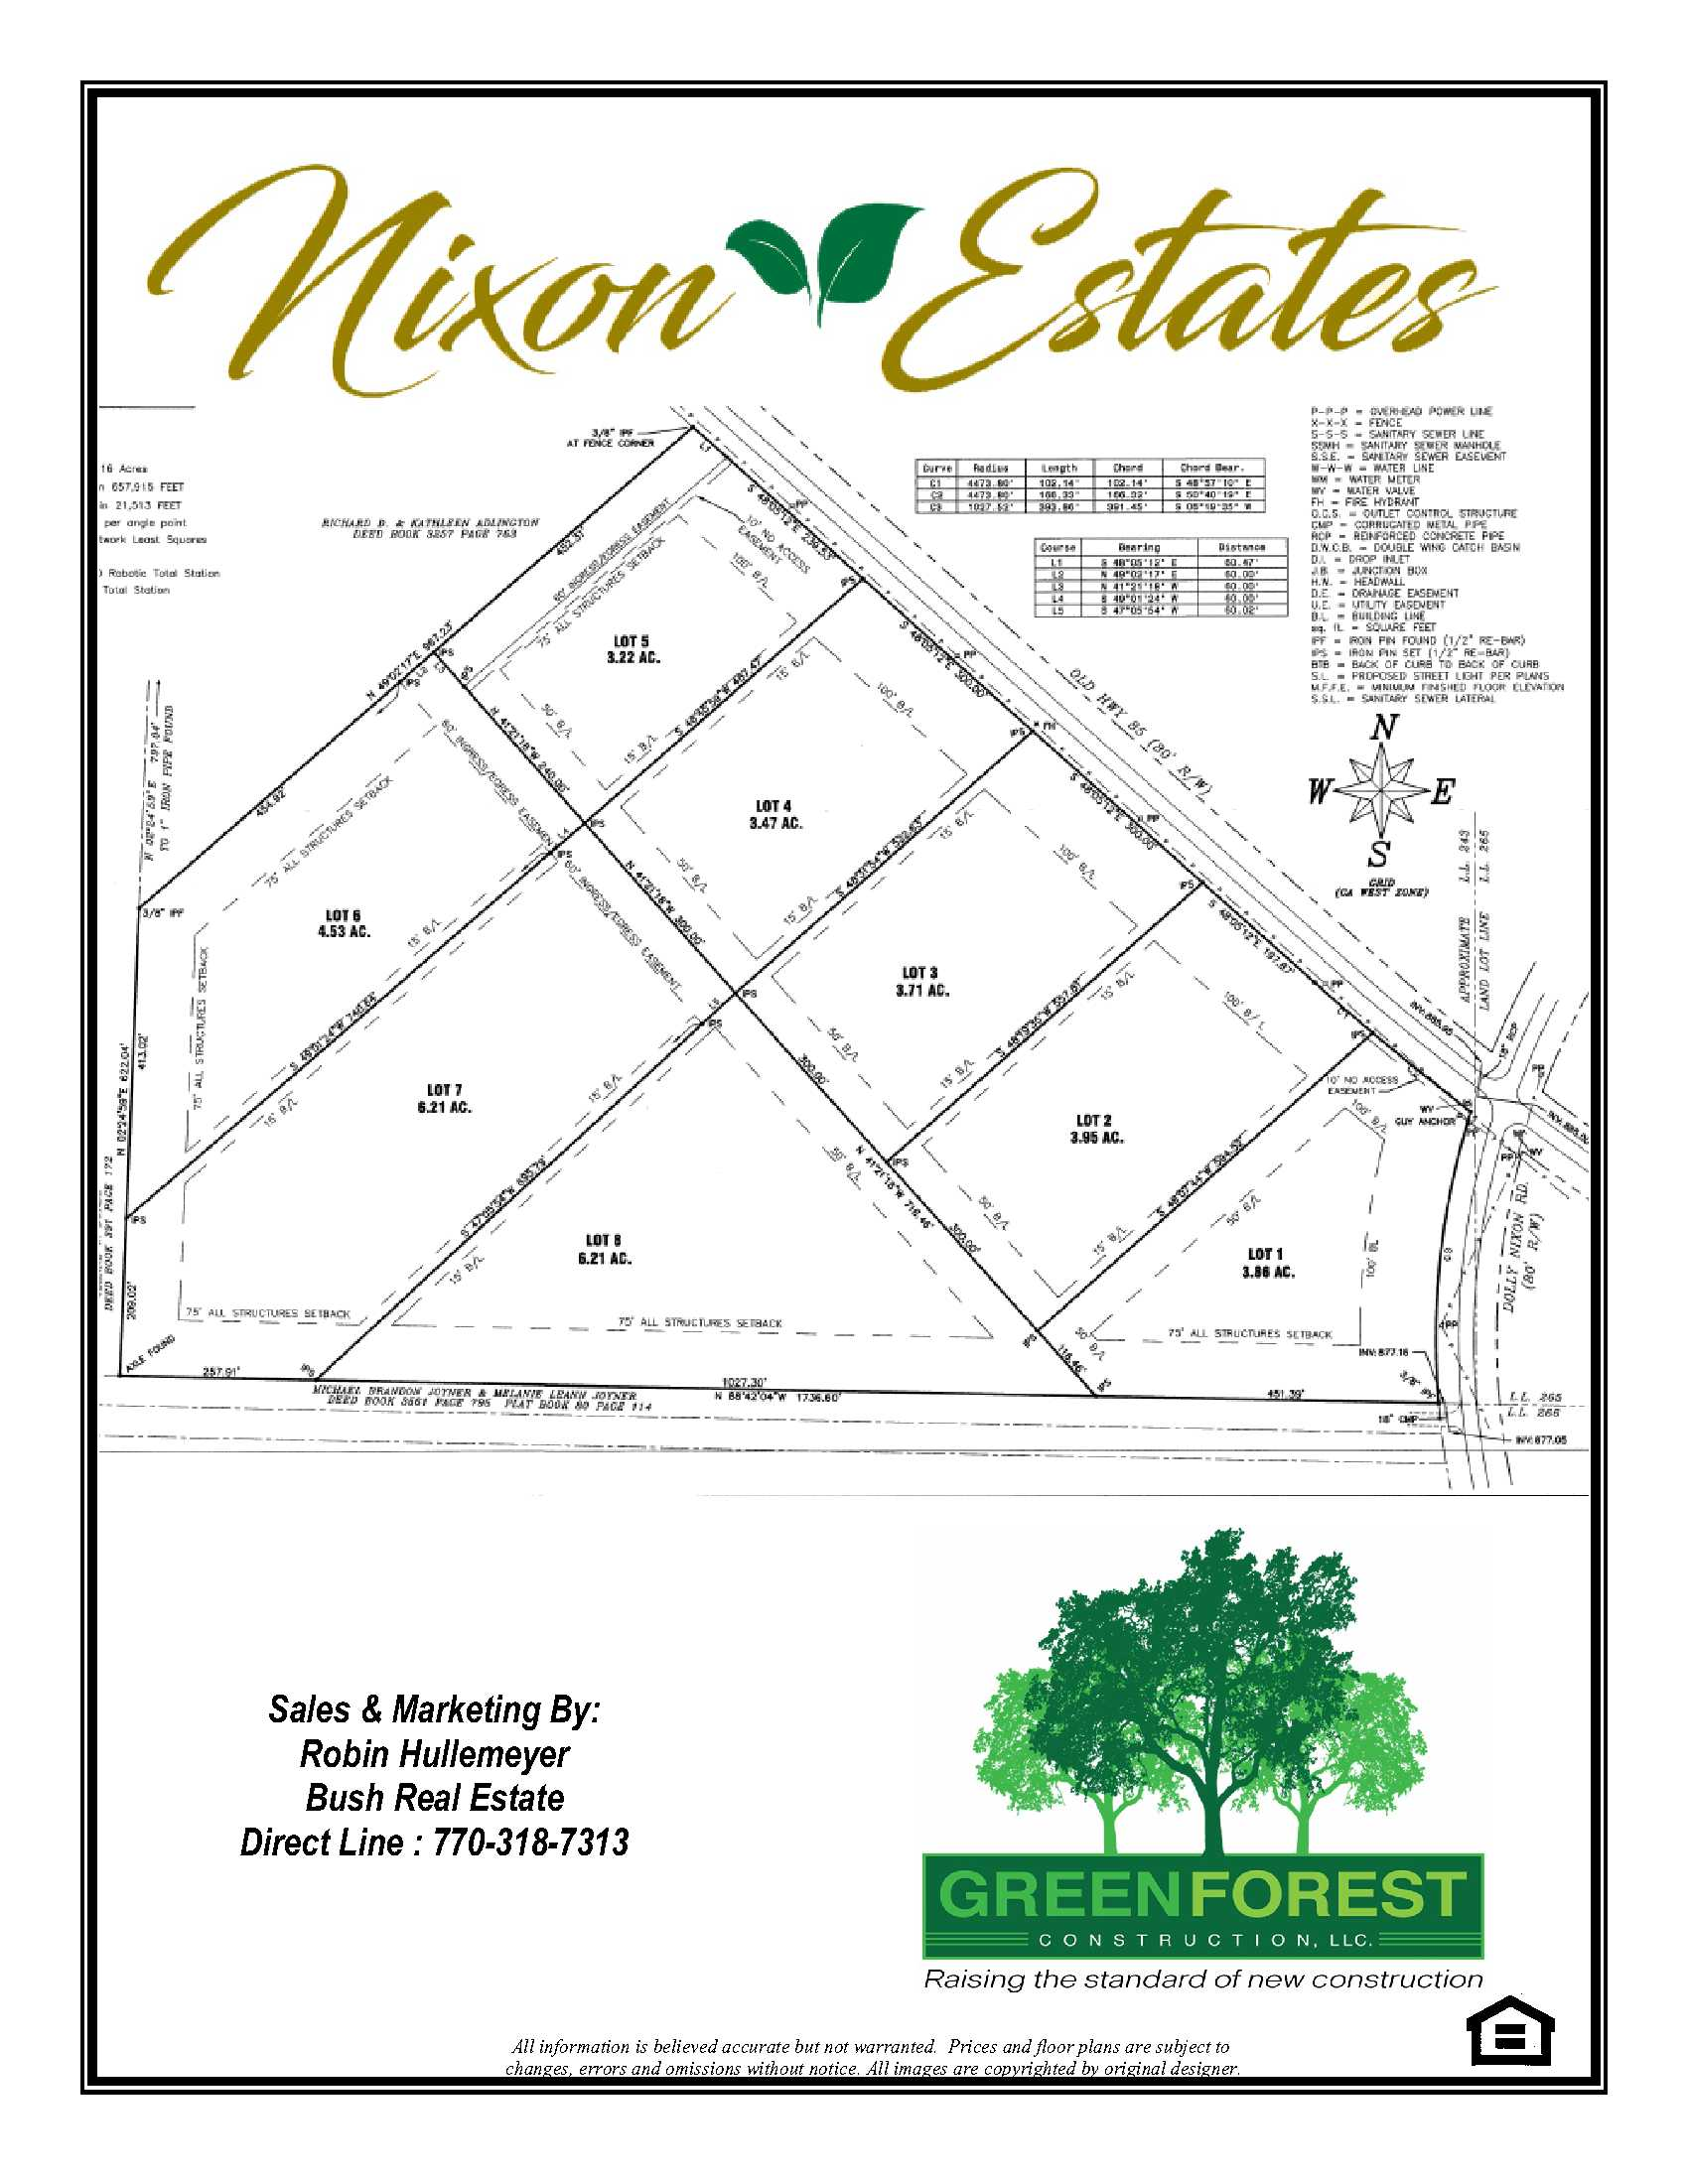 03.13.17 - Nixon Estates Full Package_4.jpg